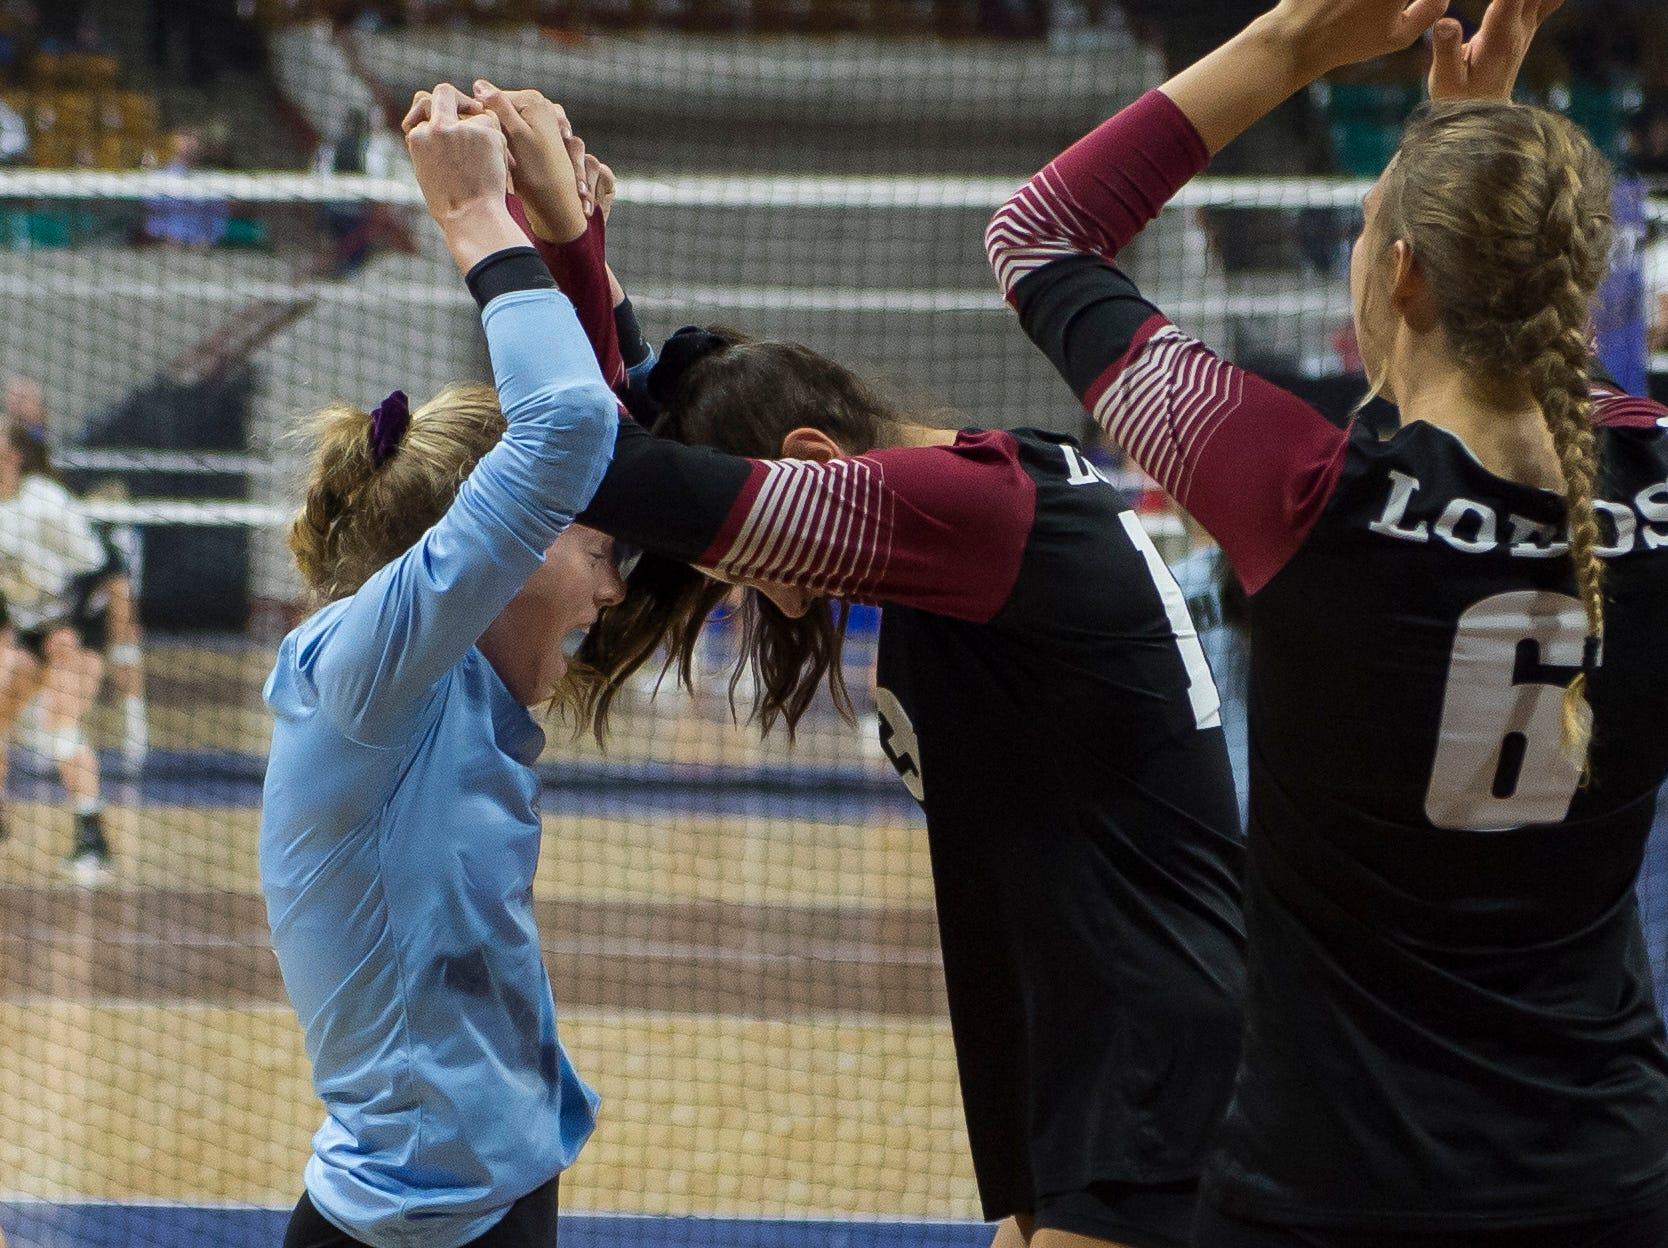 Rocky Mountain High School senior Annika Larson (1) talks to freshman Pryor MacEachran (13) during a first round state game against Eaglecrest on Thursday, Nov. 8, 2018, at the Denver Coliseum in Denver, Colo.